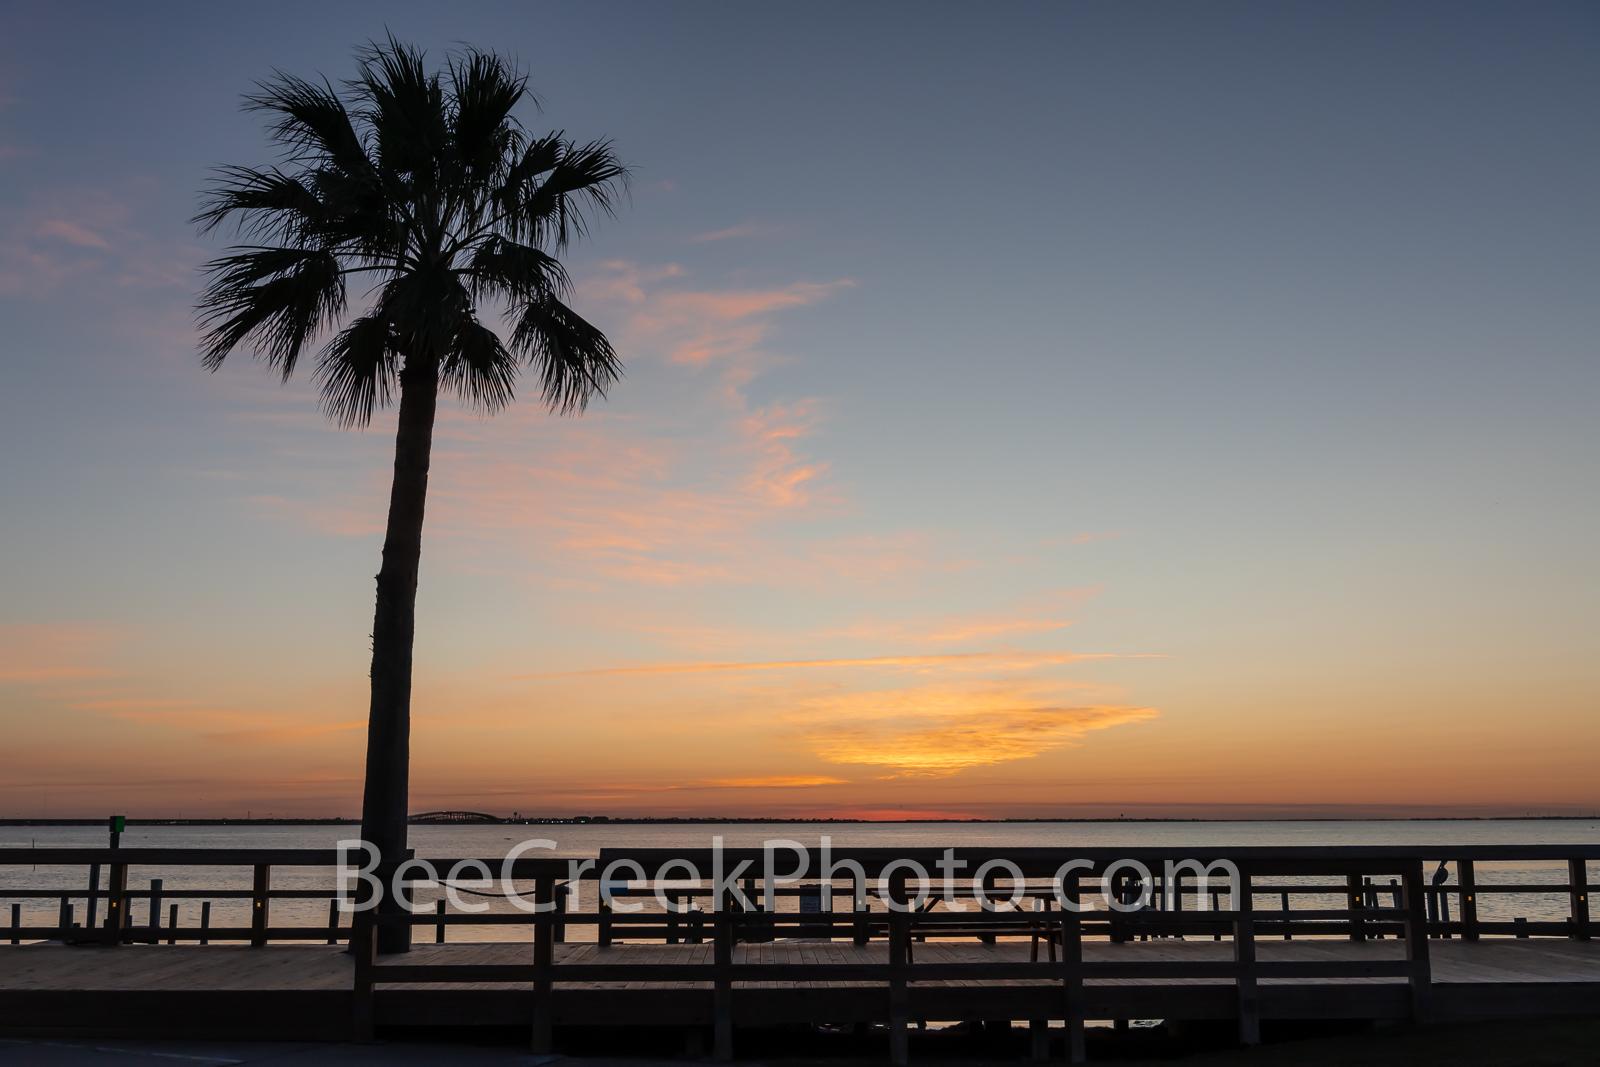 Palm Sunset, sunset, palm tree, south padre island, laquna madre, padre island, seashore, beach. beach scene, boardwalk, island, coastal, seascape, landscape, , photo